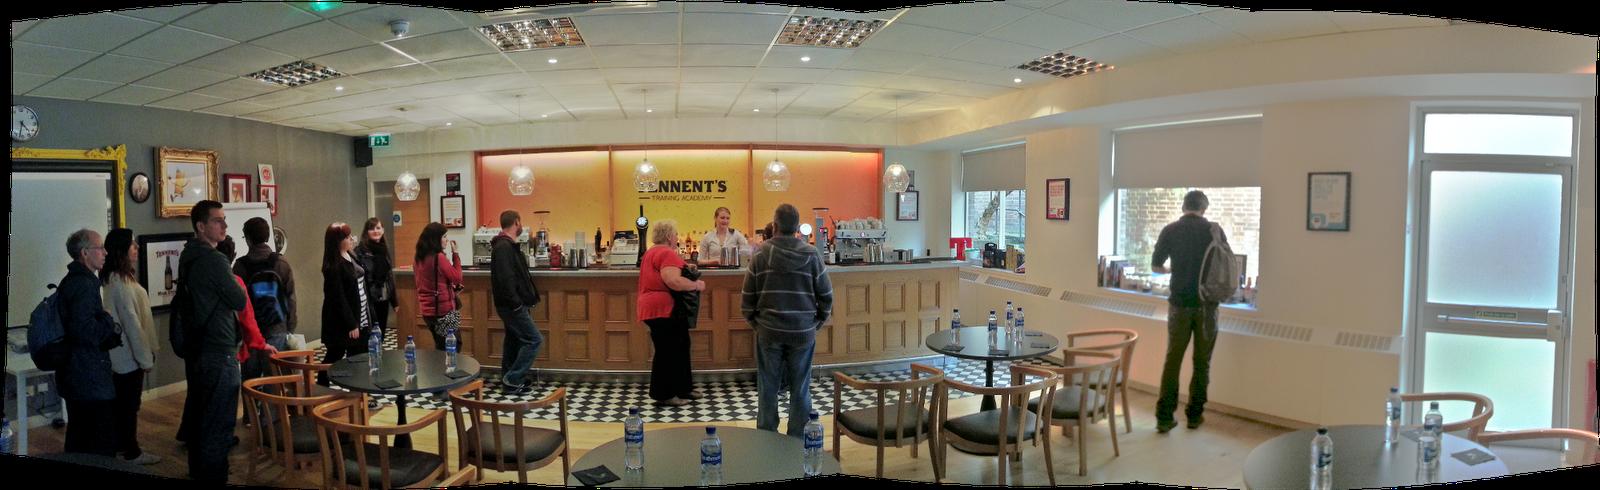 Tennents Academy Bar, Glasgow